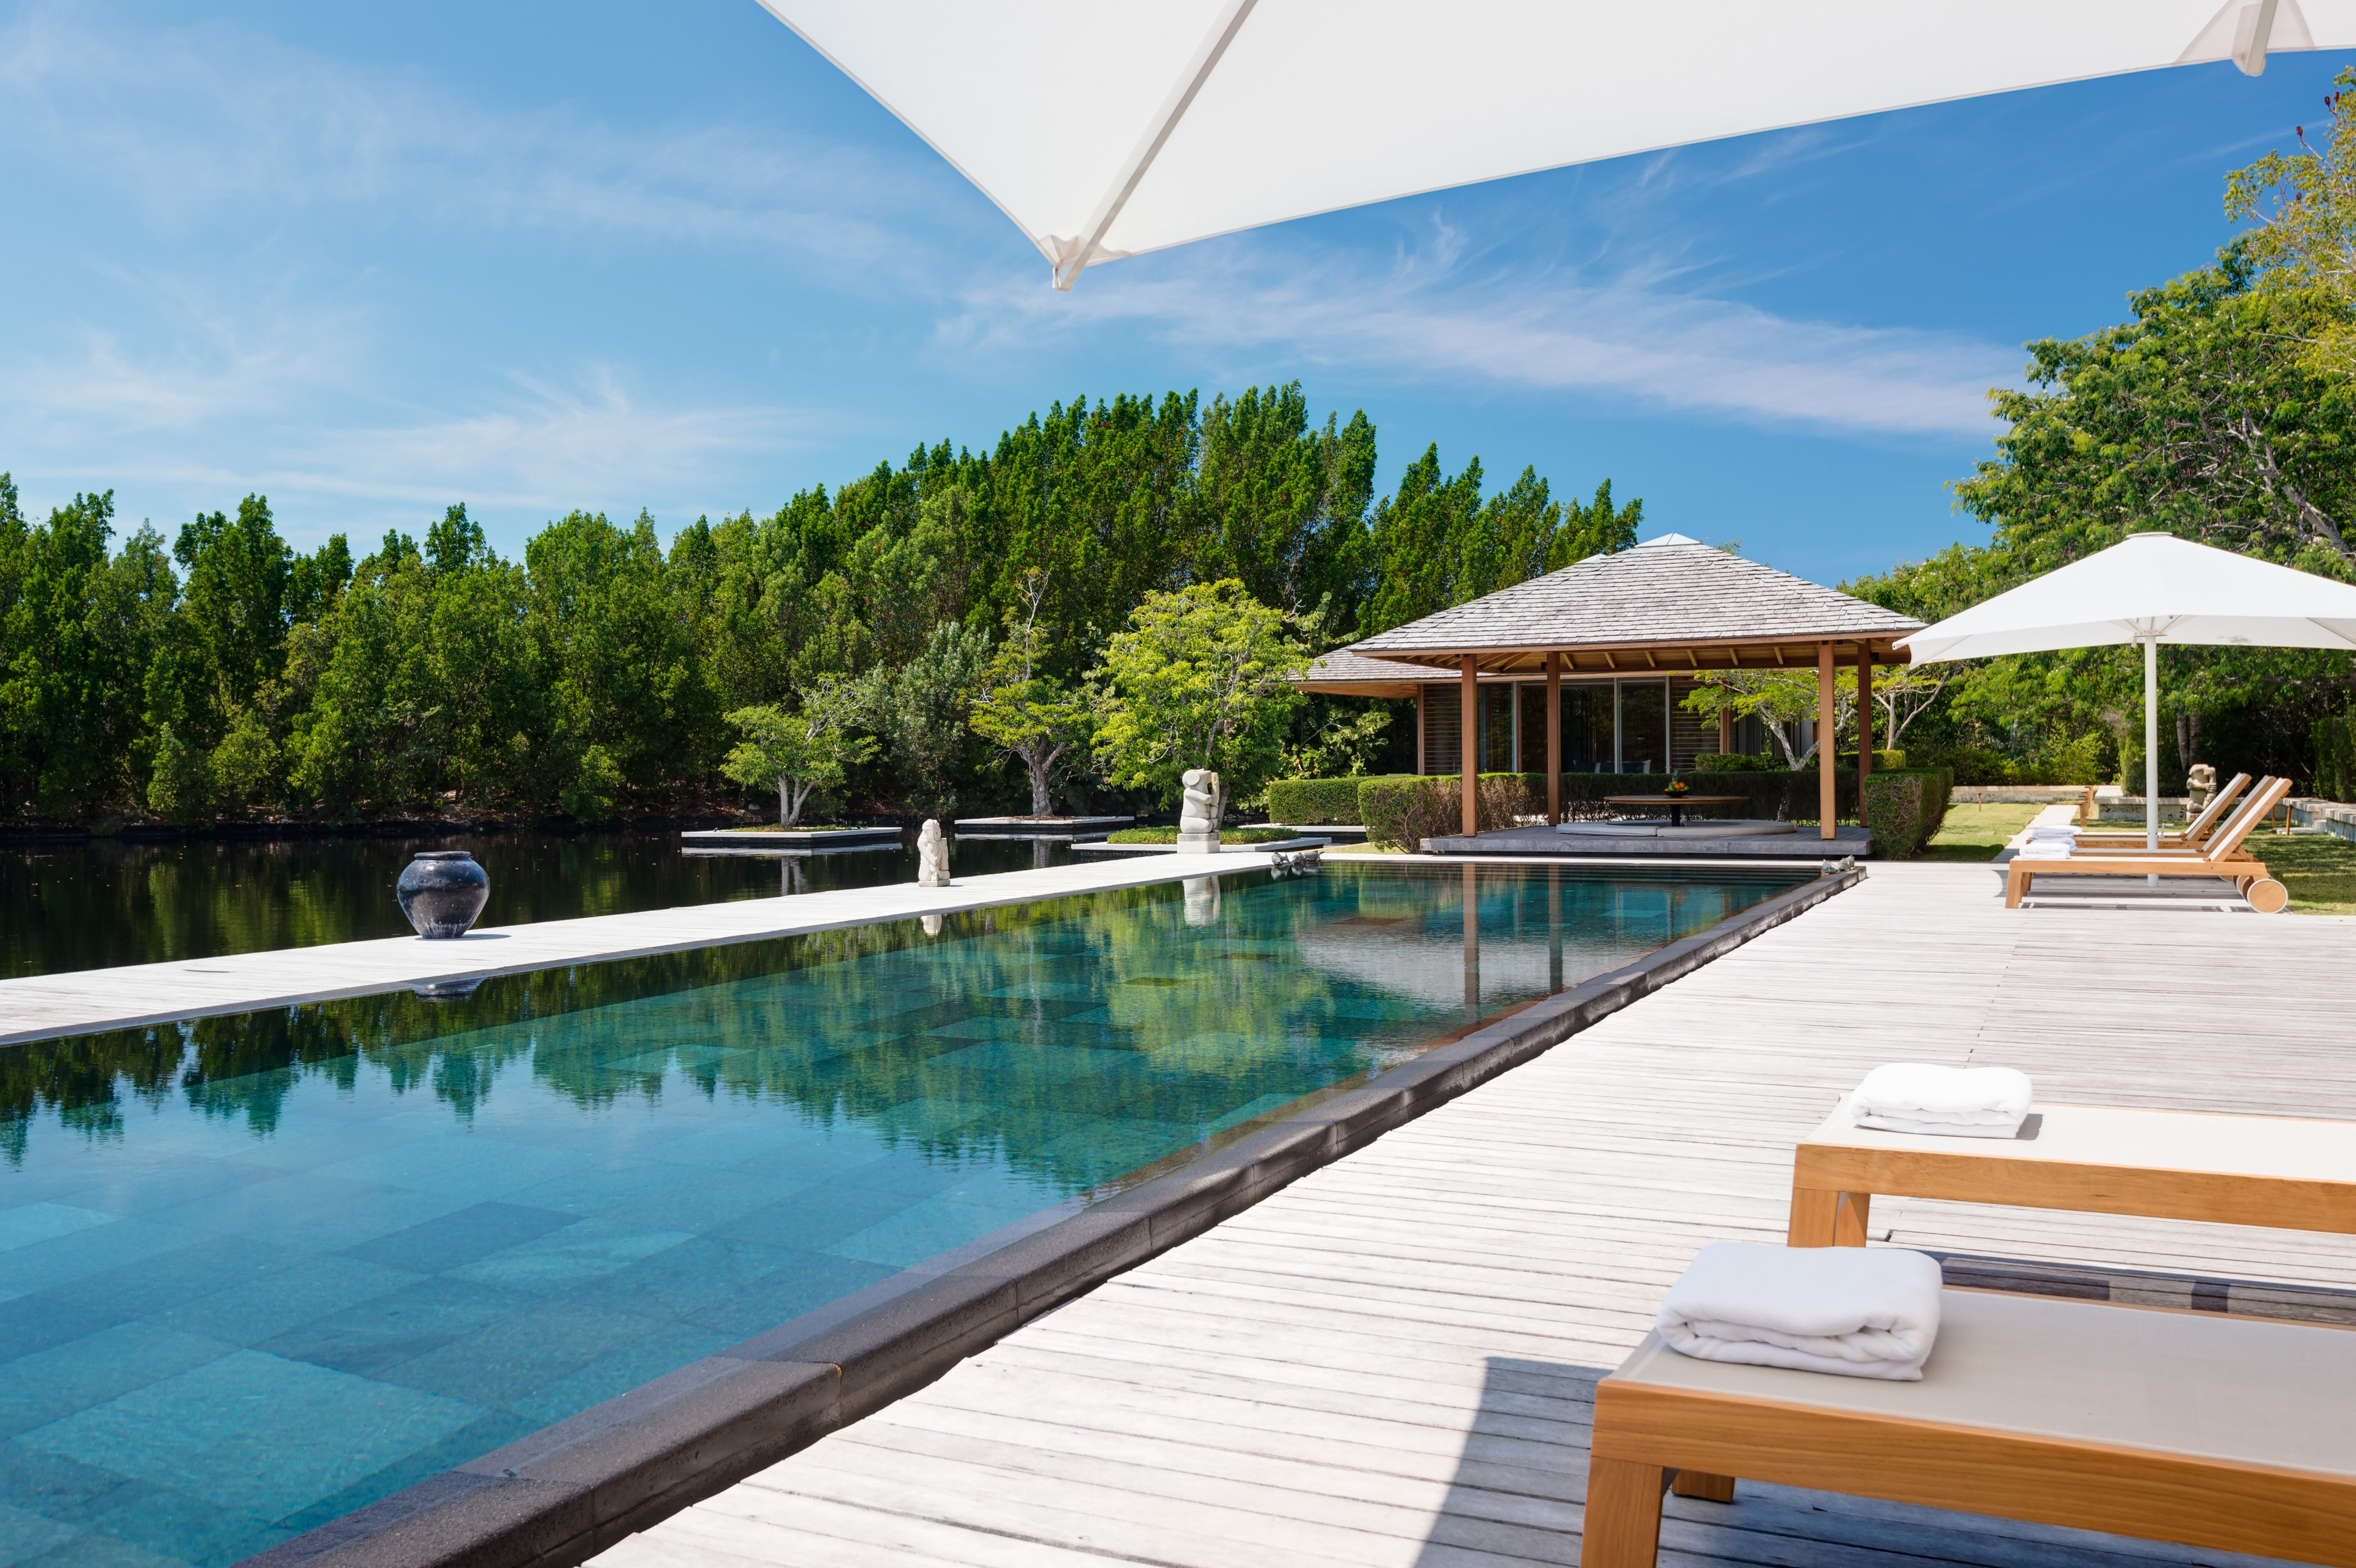 Additional photo for property listing at Amanyara Villa 14 Amanyara Resort, North West Point, Провиденсьялес Теркс И Кайкос